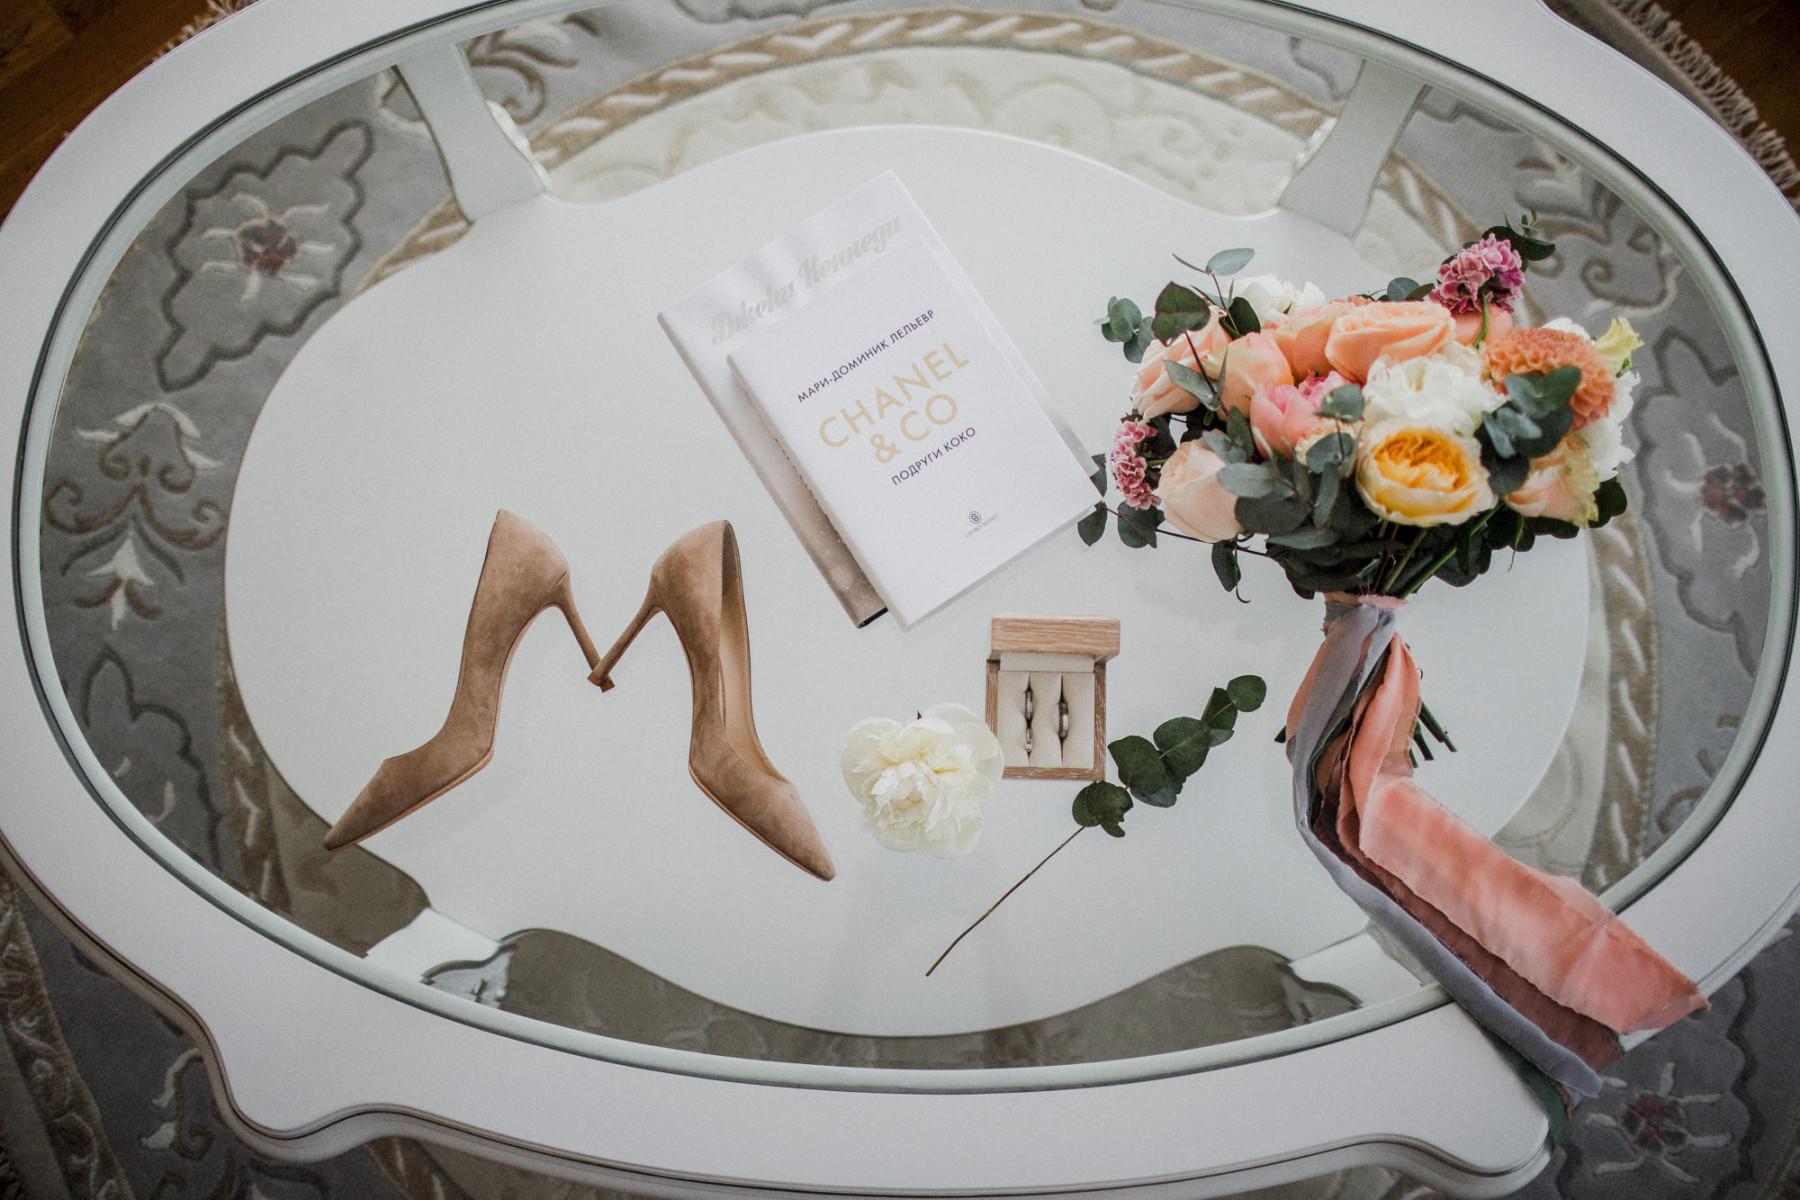 Make it to me: свадьба в загородной